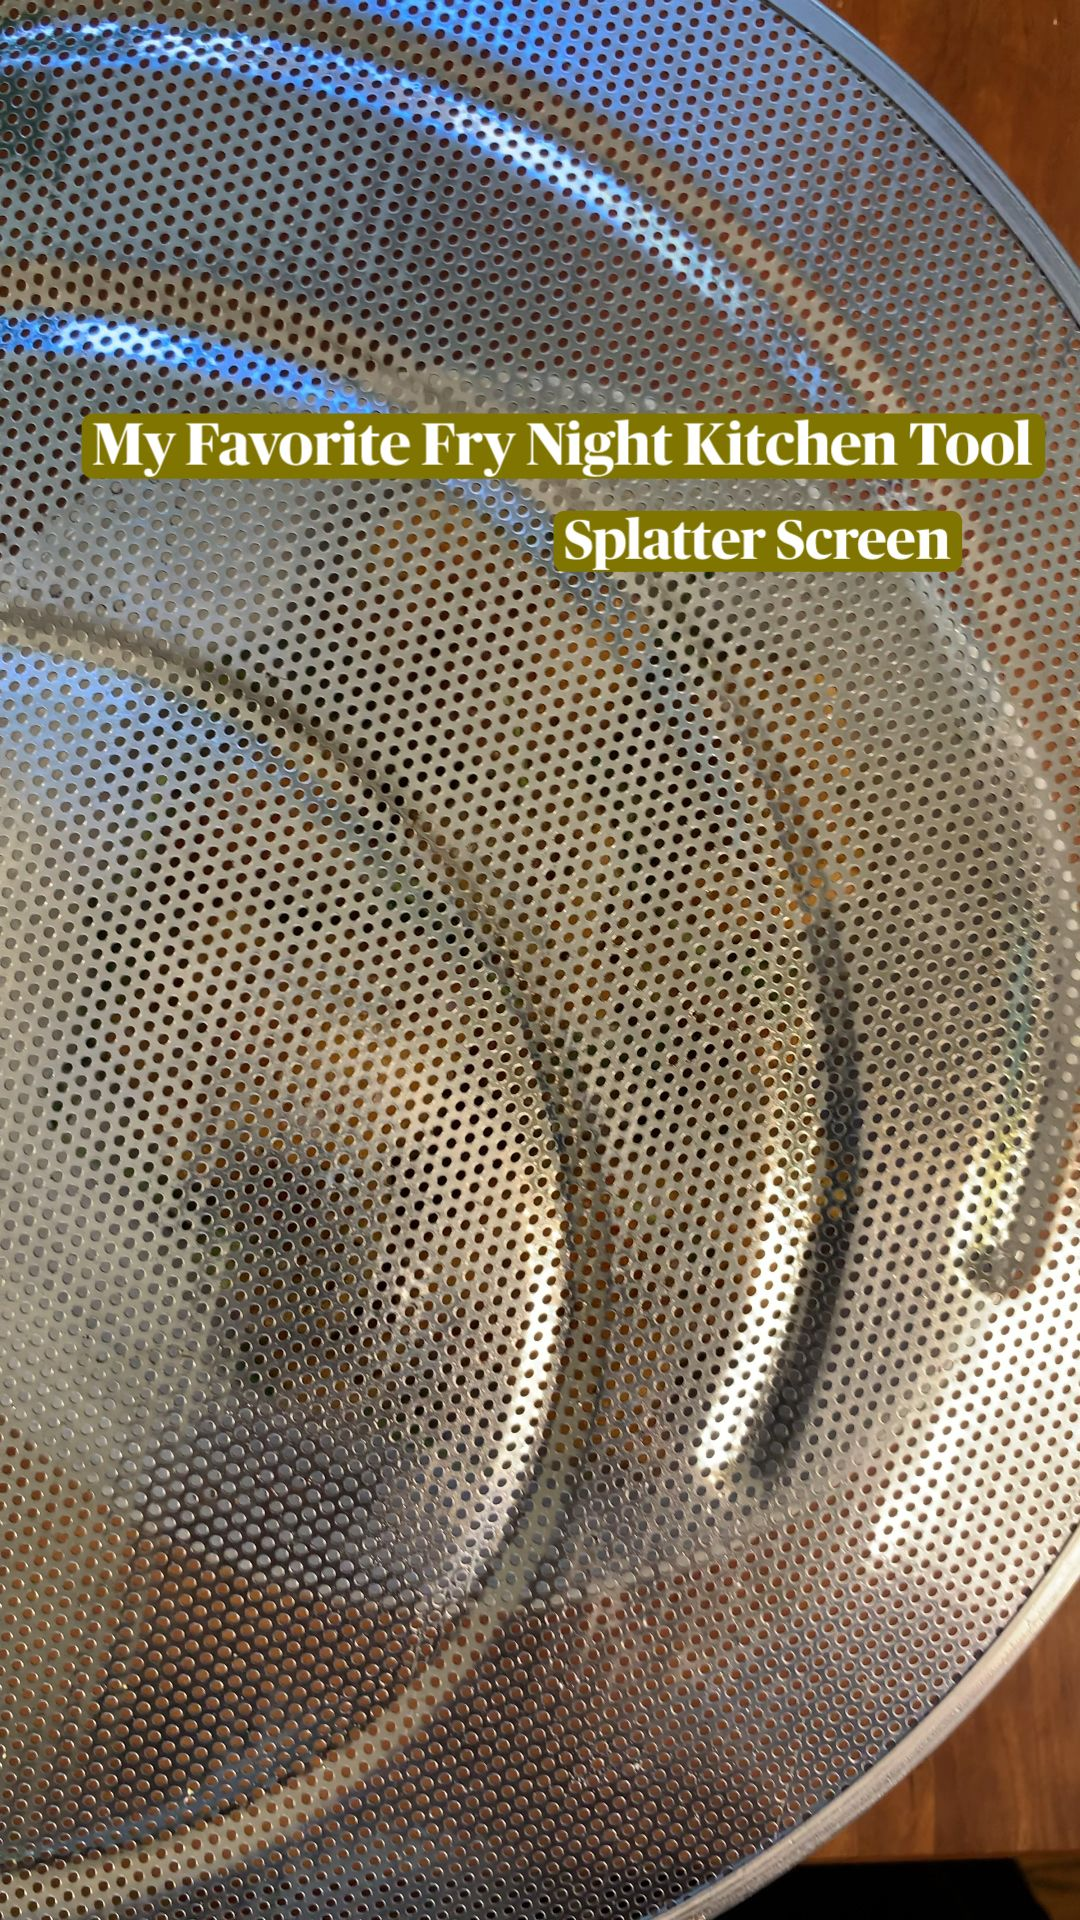 My Favorite Fry Night Kitchen Tool